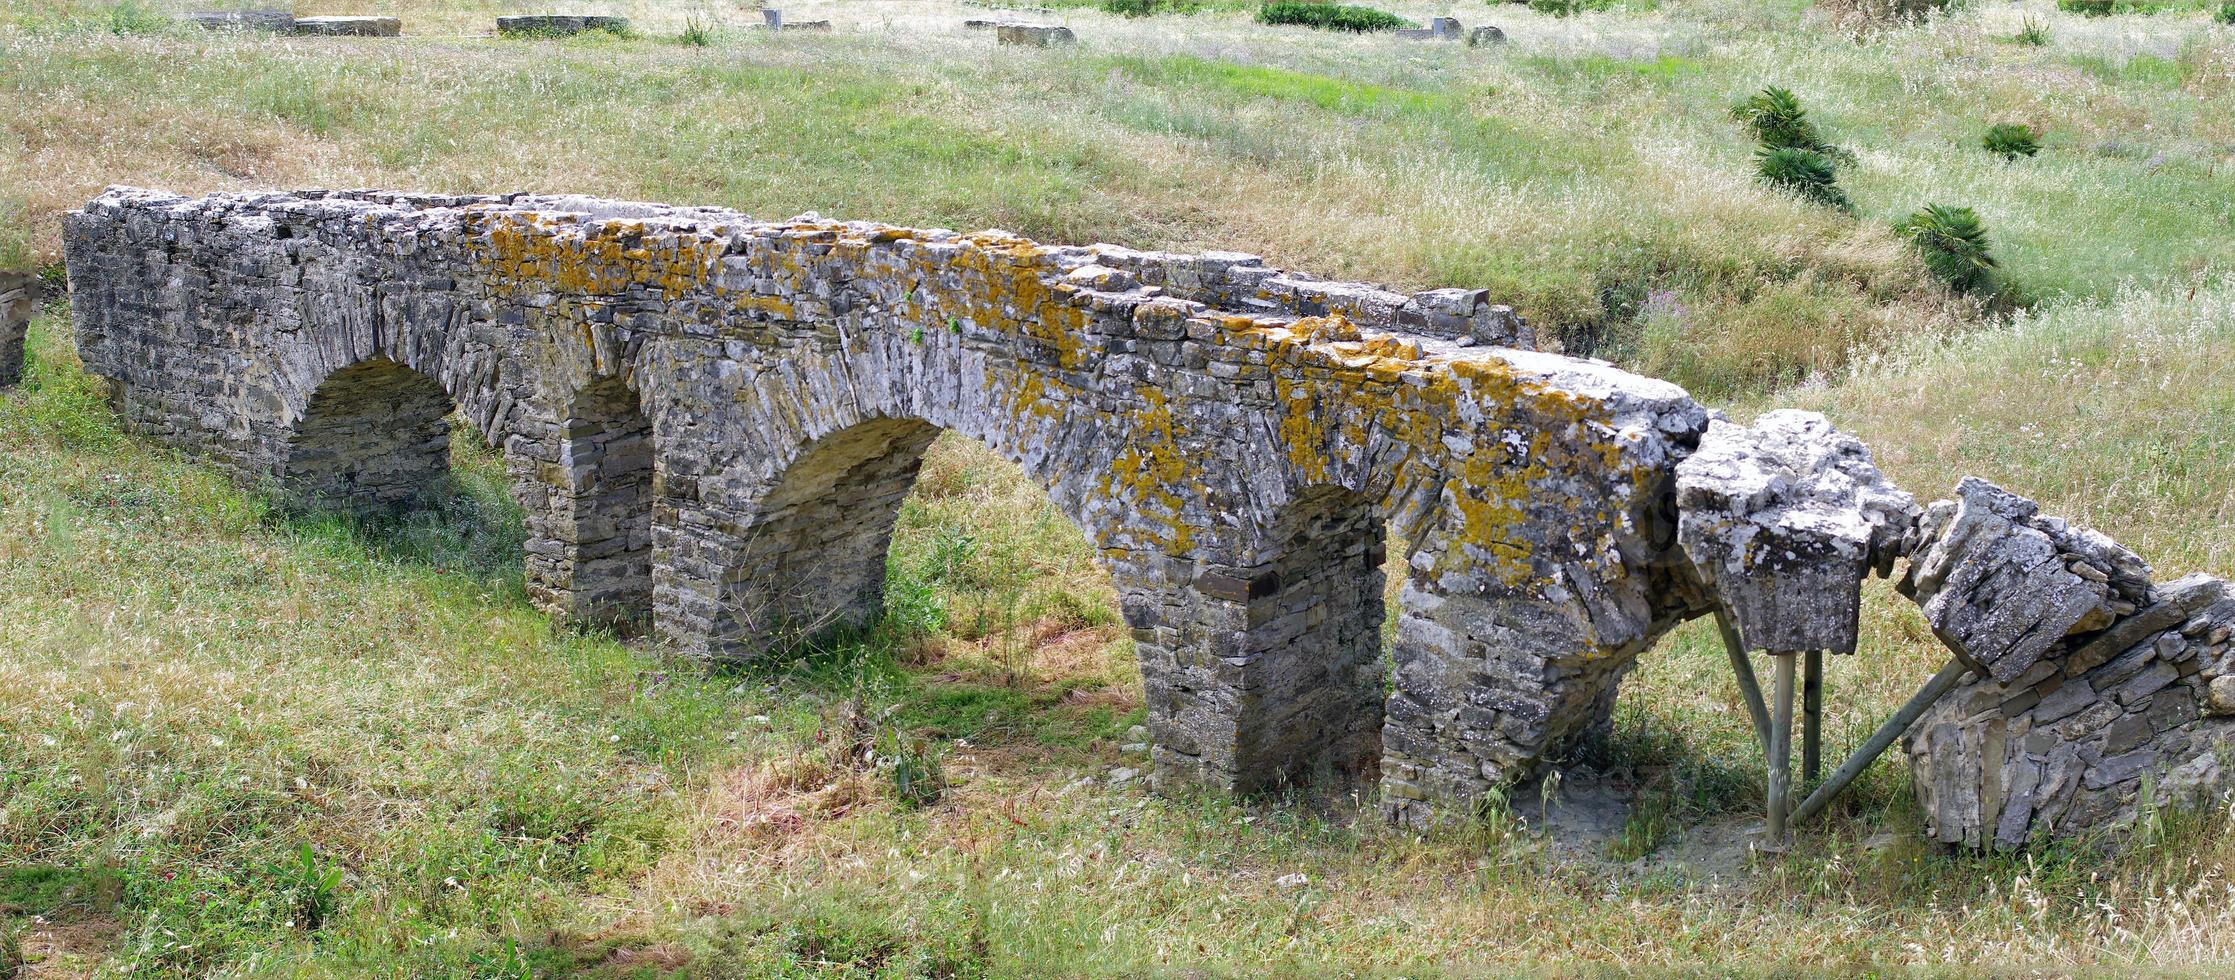 Romeins aquaduct in Spanje. foto